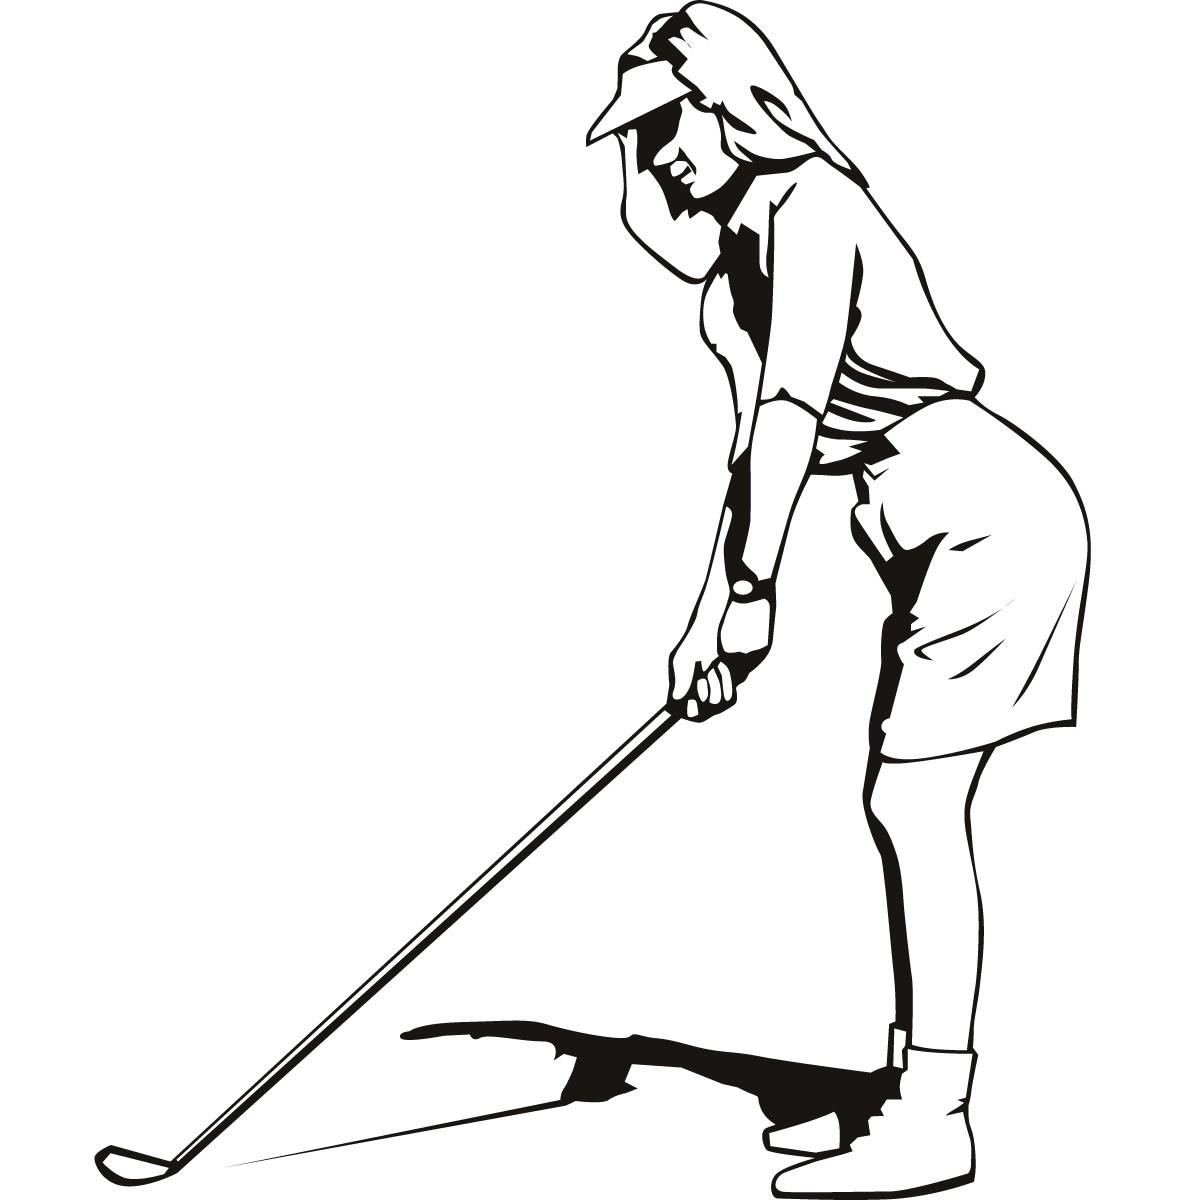 1200x1200 Clip Art Golf Silhouette Clip Art